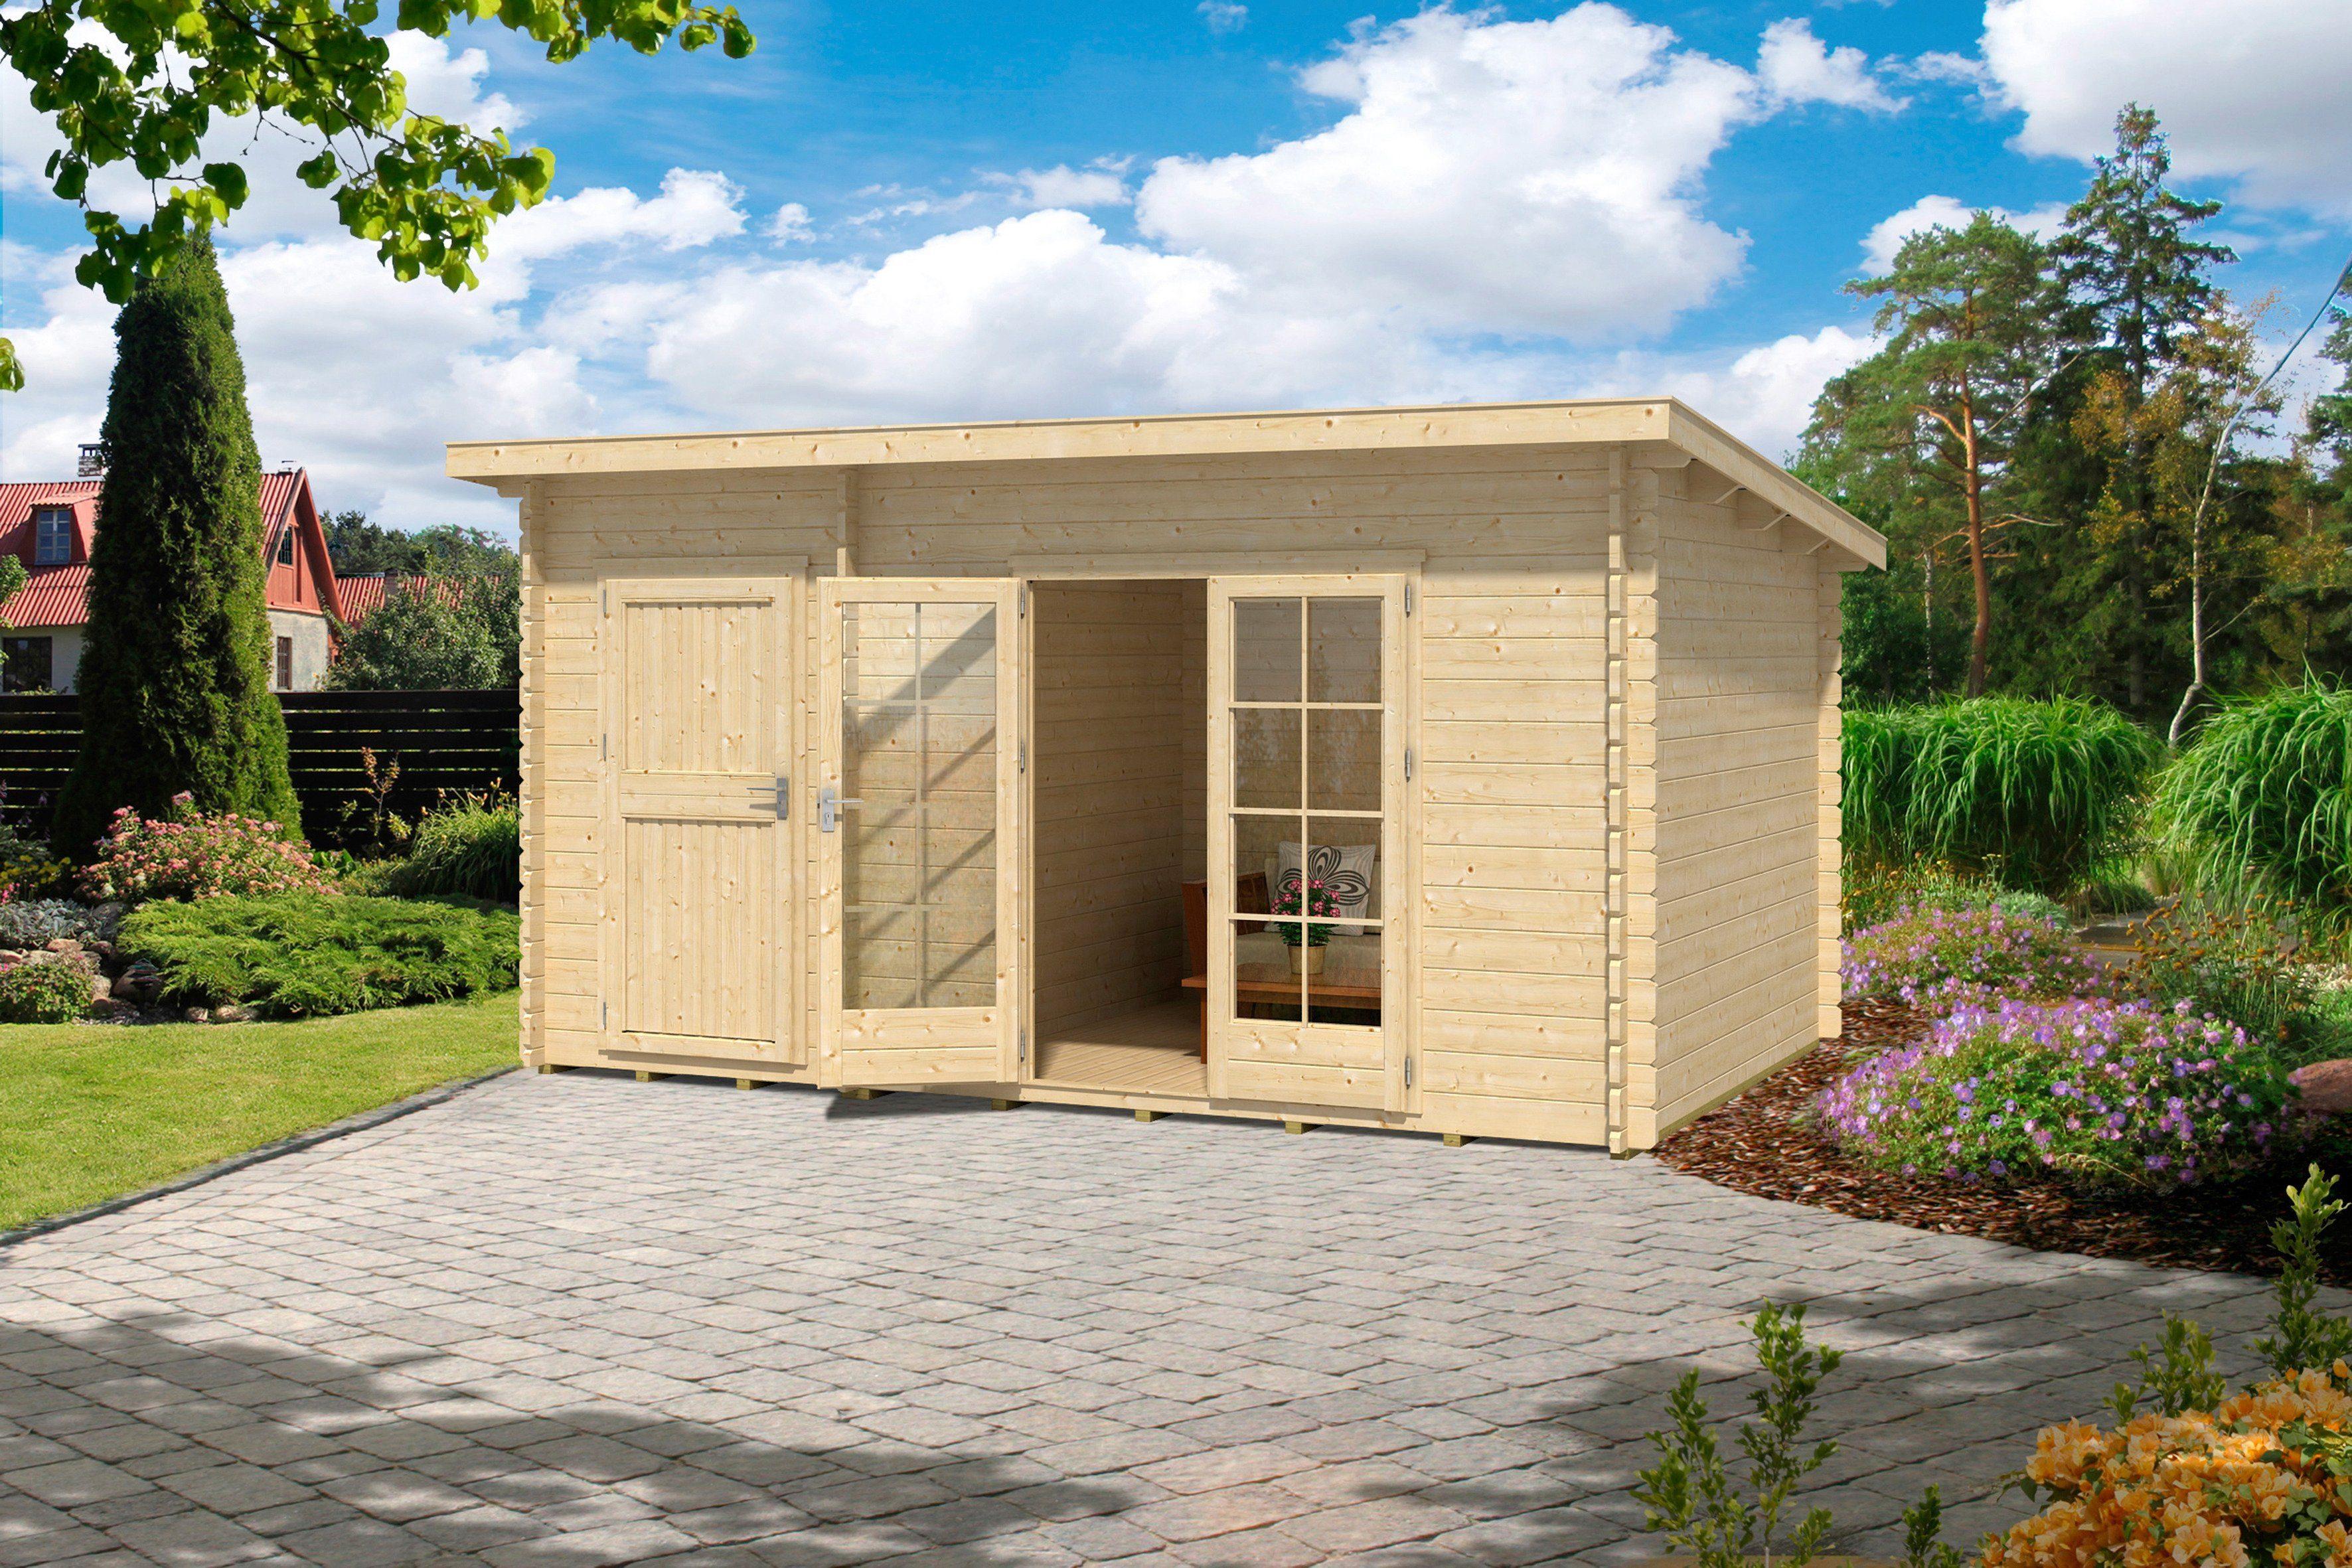 OUTDOOR LIFE PRODUCTS Gartenhaus »Belmont 2«, BxT: 430x280 cm, 34 mm